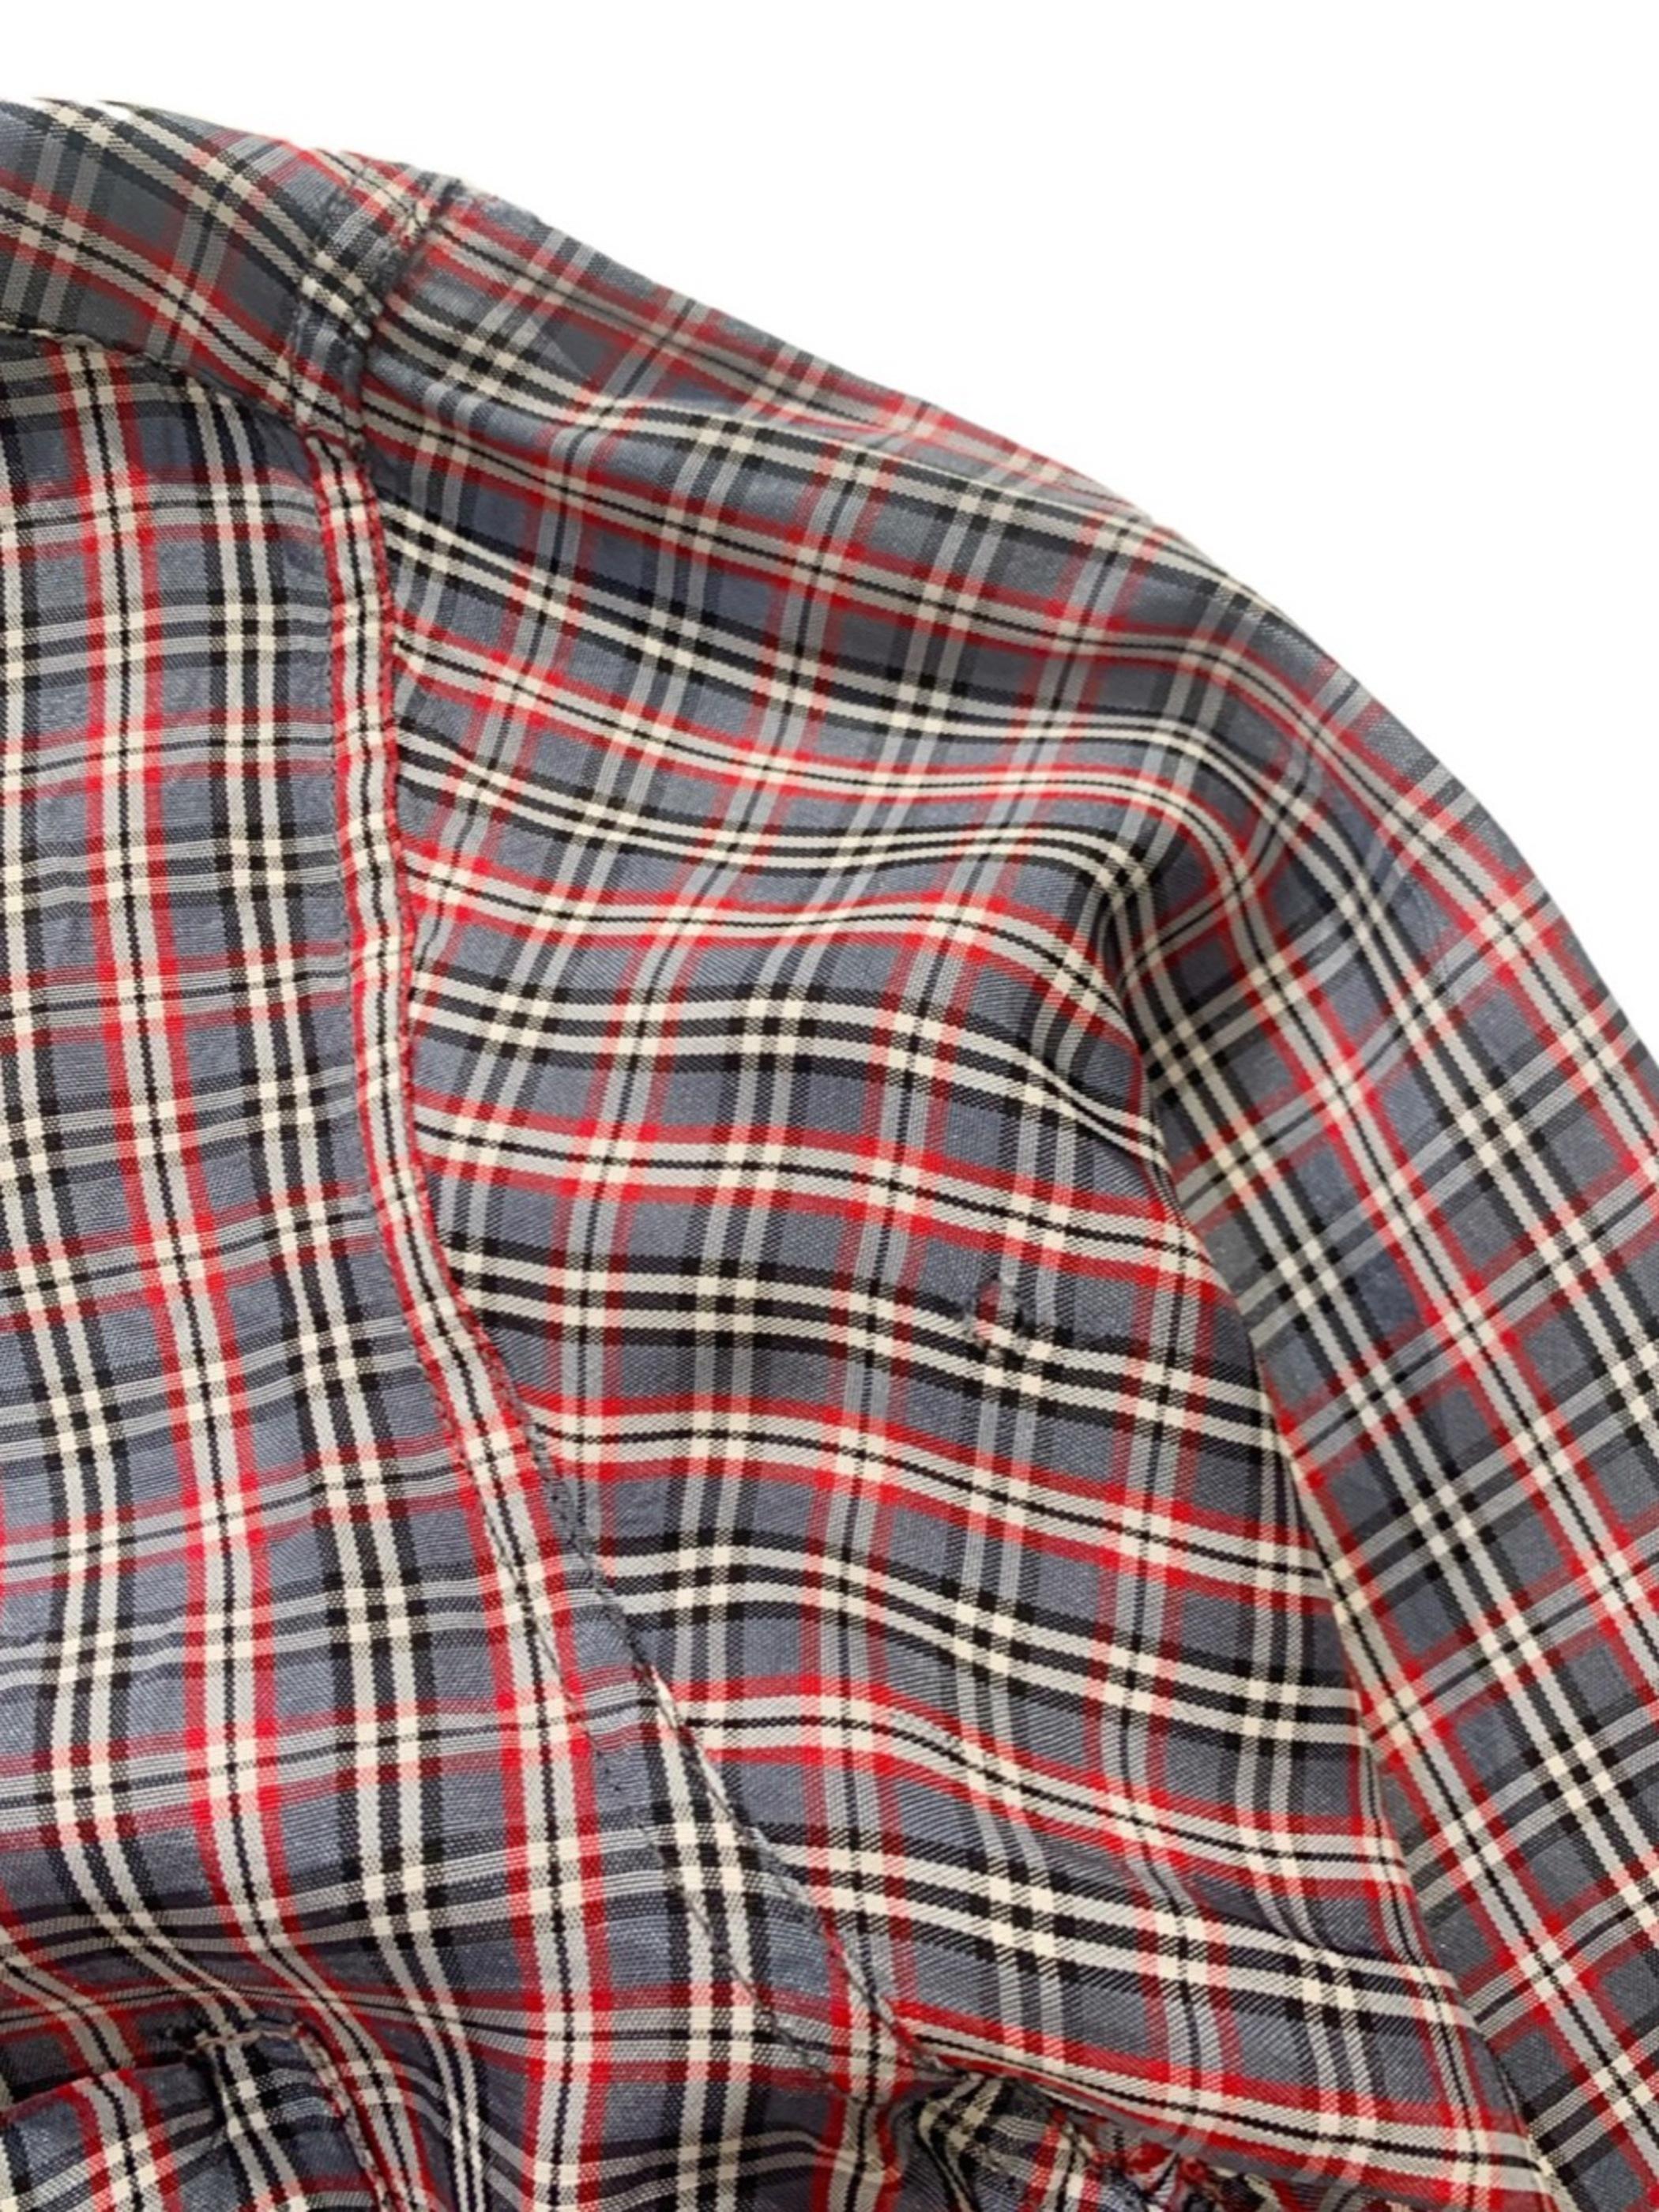 1960's Button down shirt